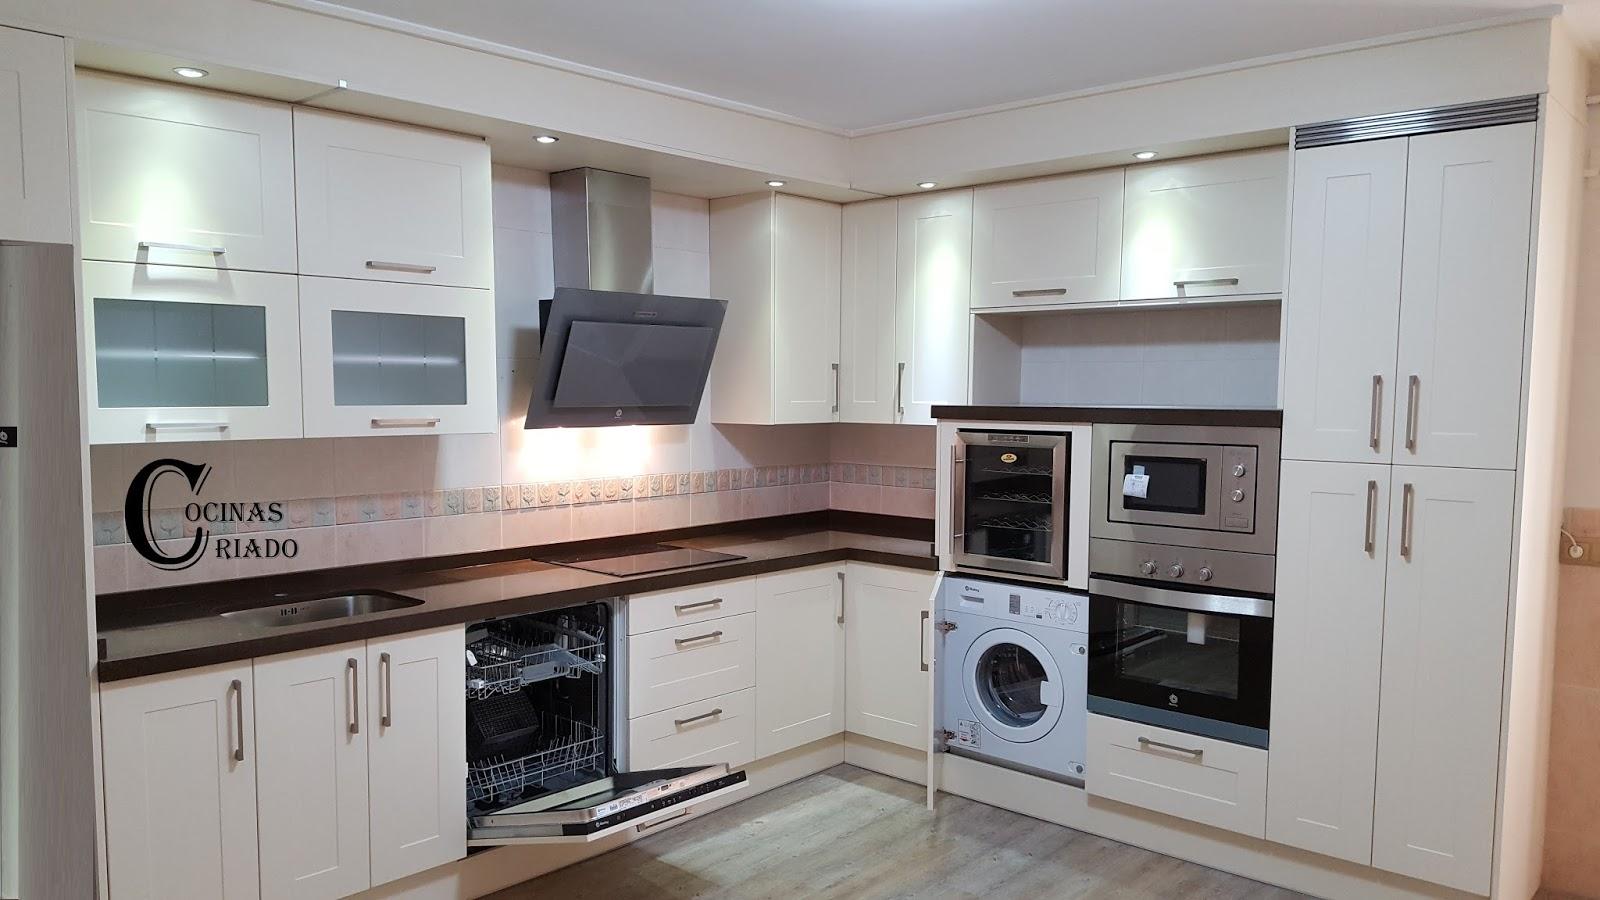 Cocinas criado electrodom sticos integrables o libre for Cocinas blancas con electrodomesticos blancos